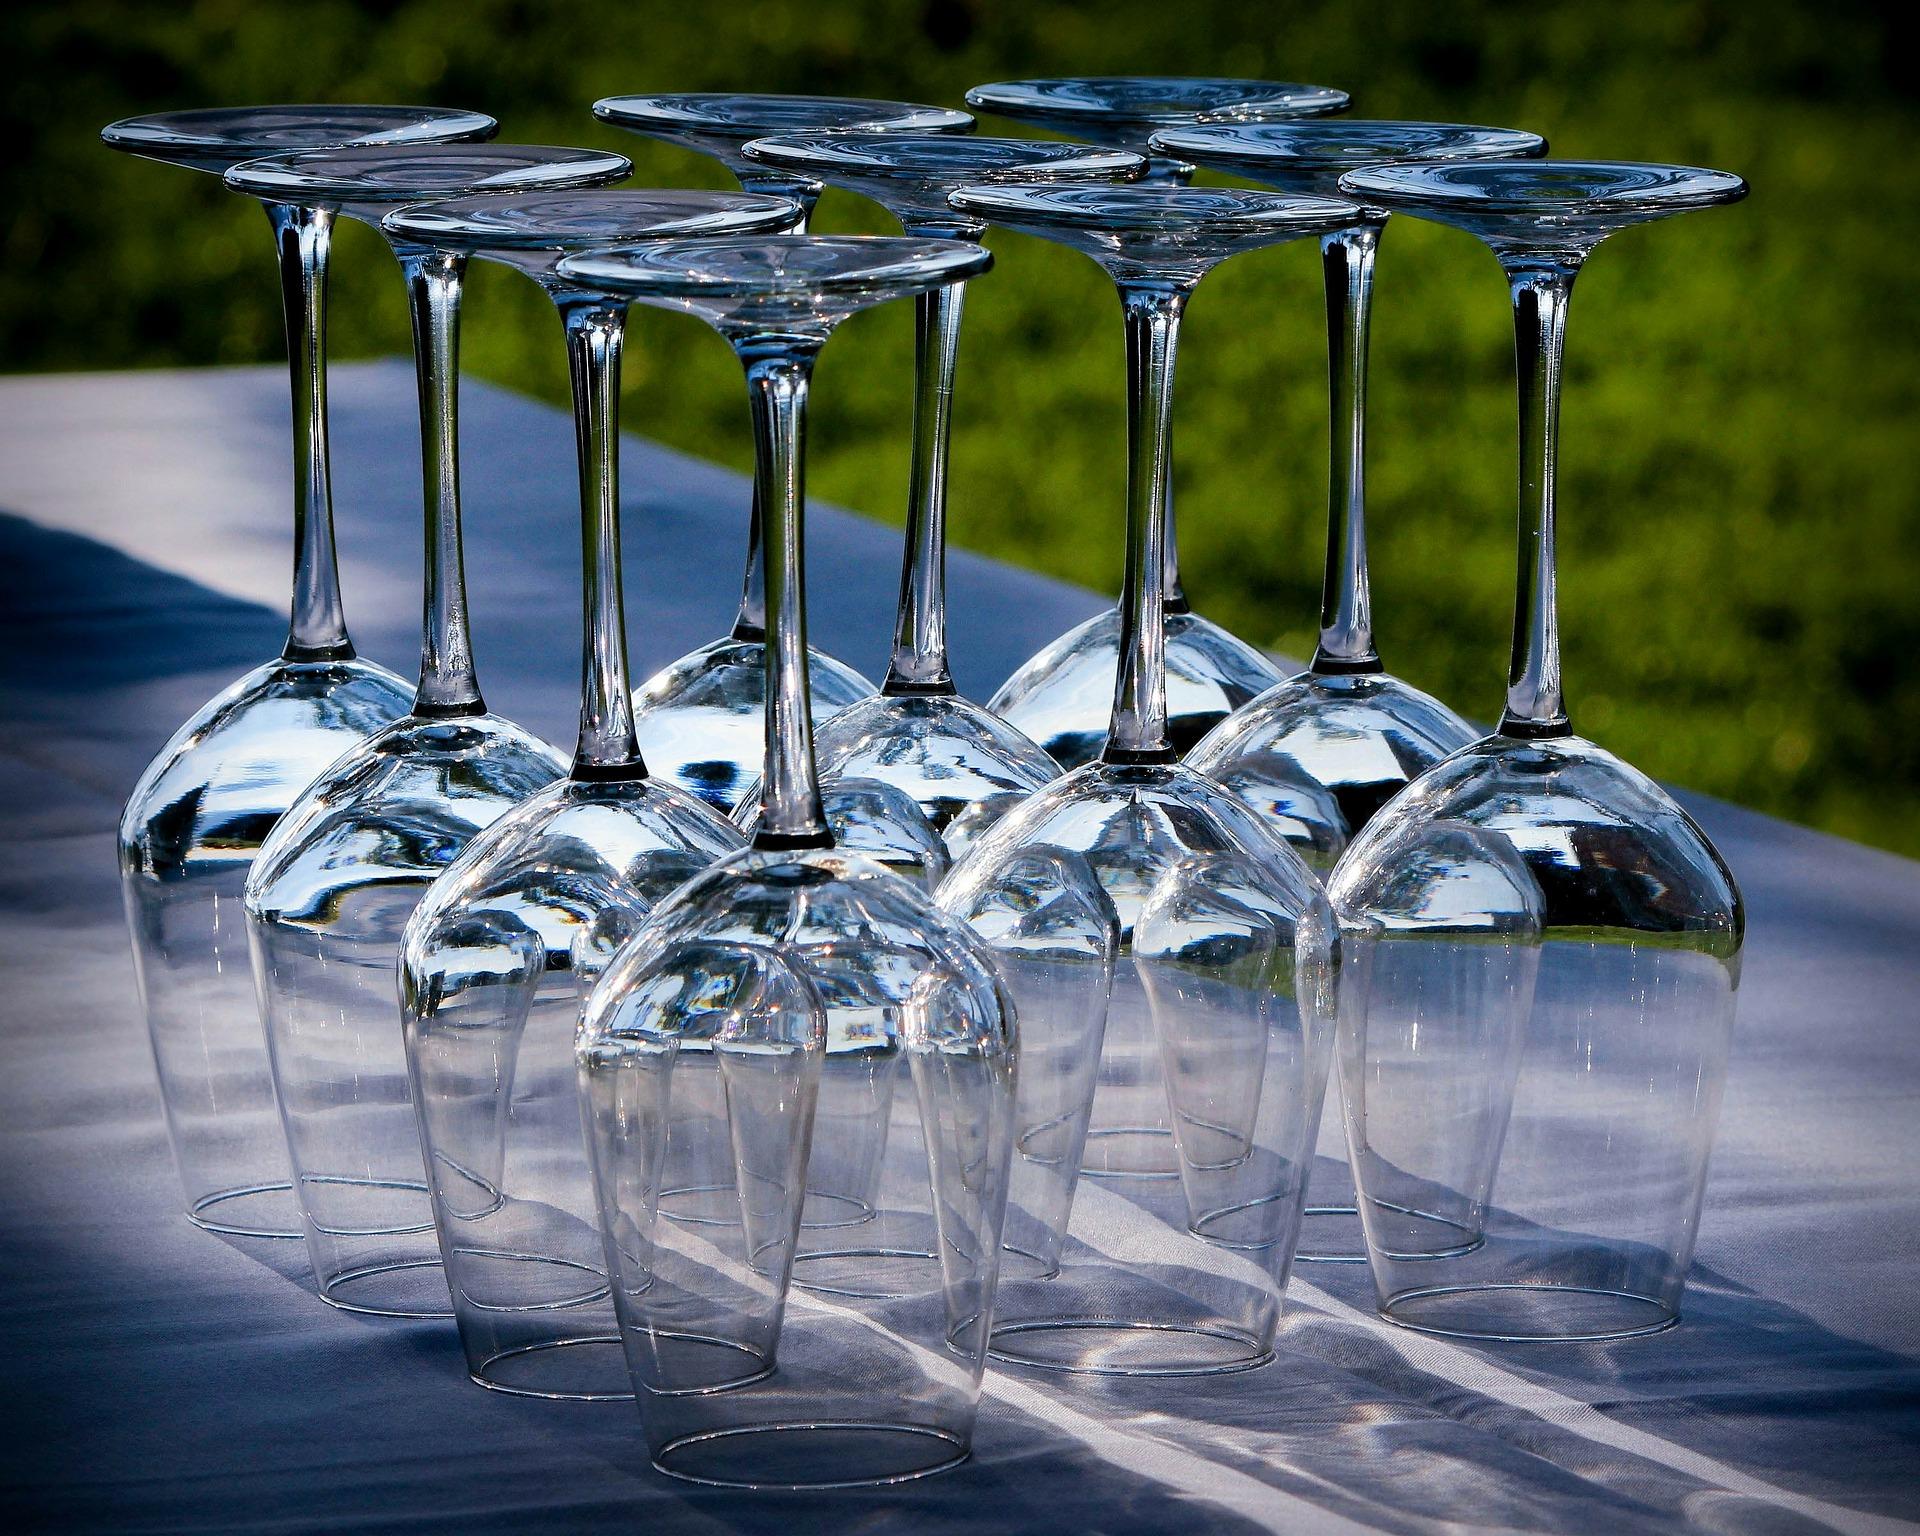 Wineglasses | © Pixabay